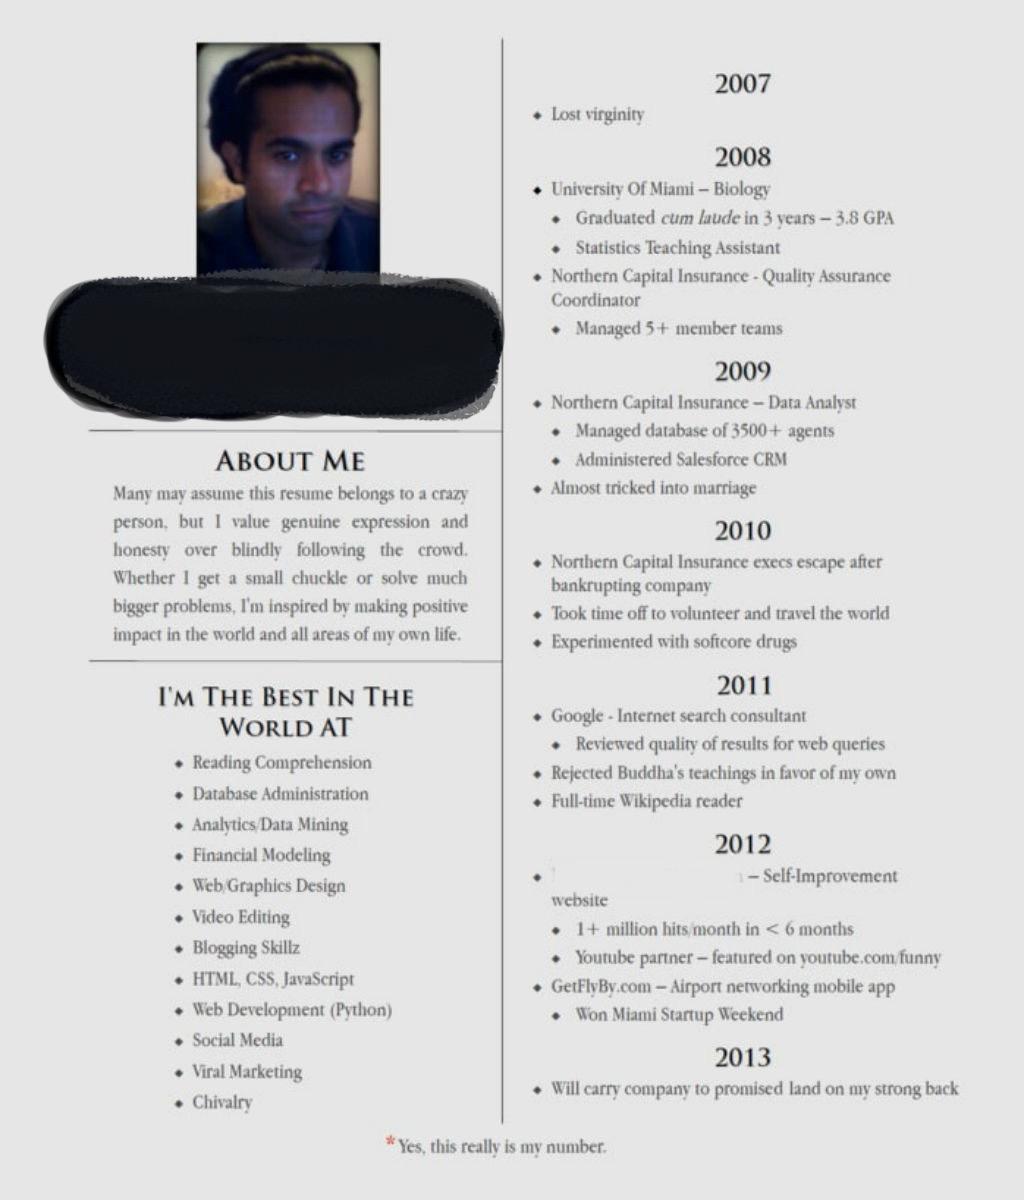 Worst resume mistakes